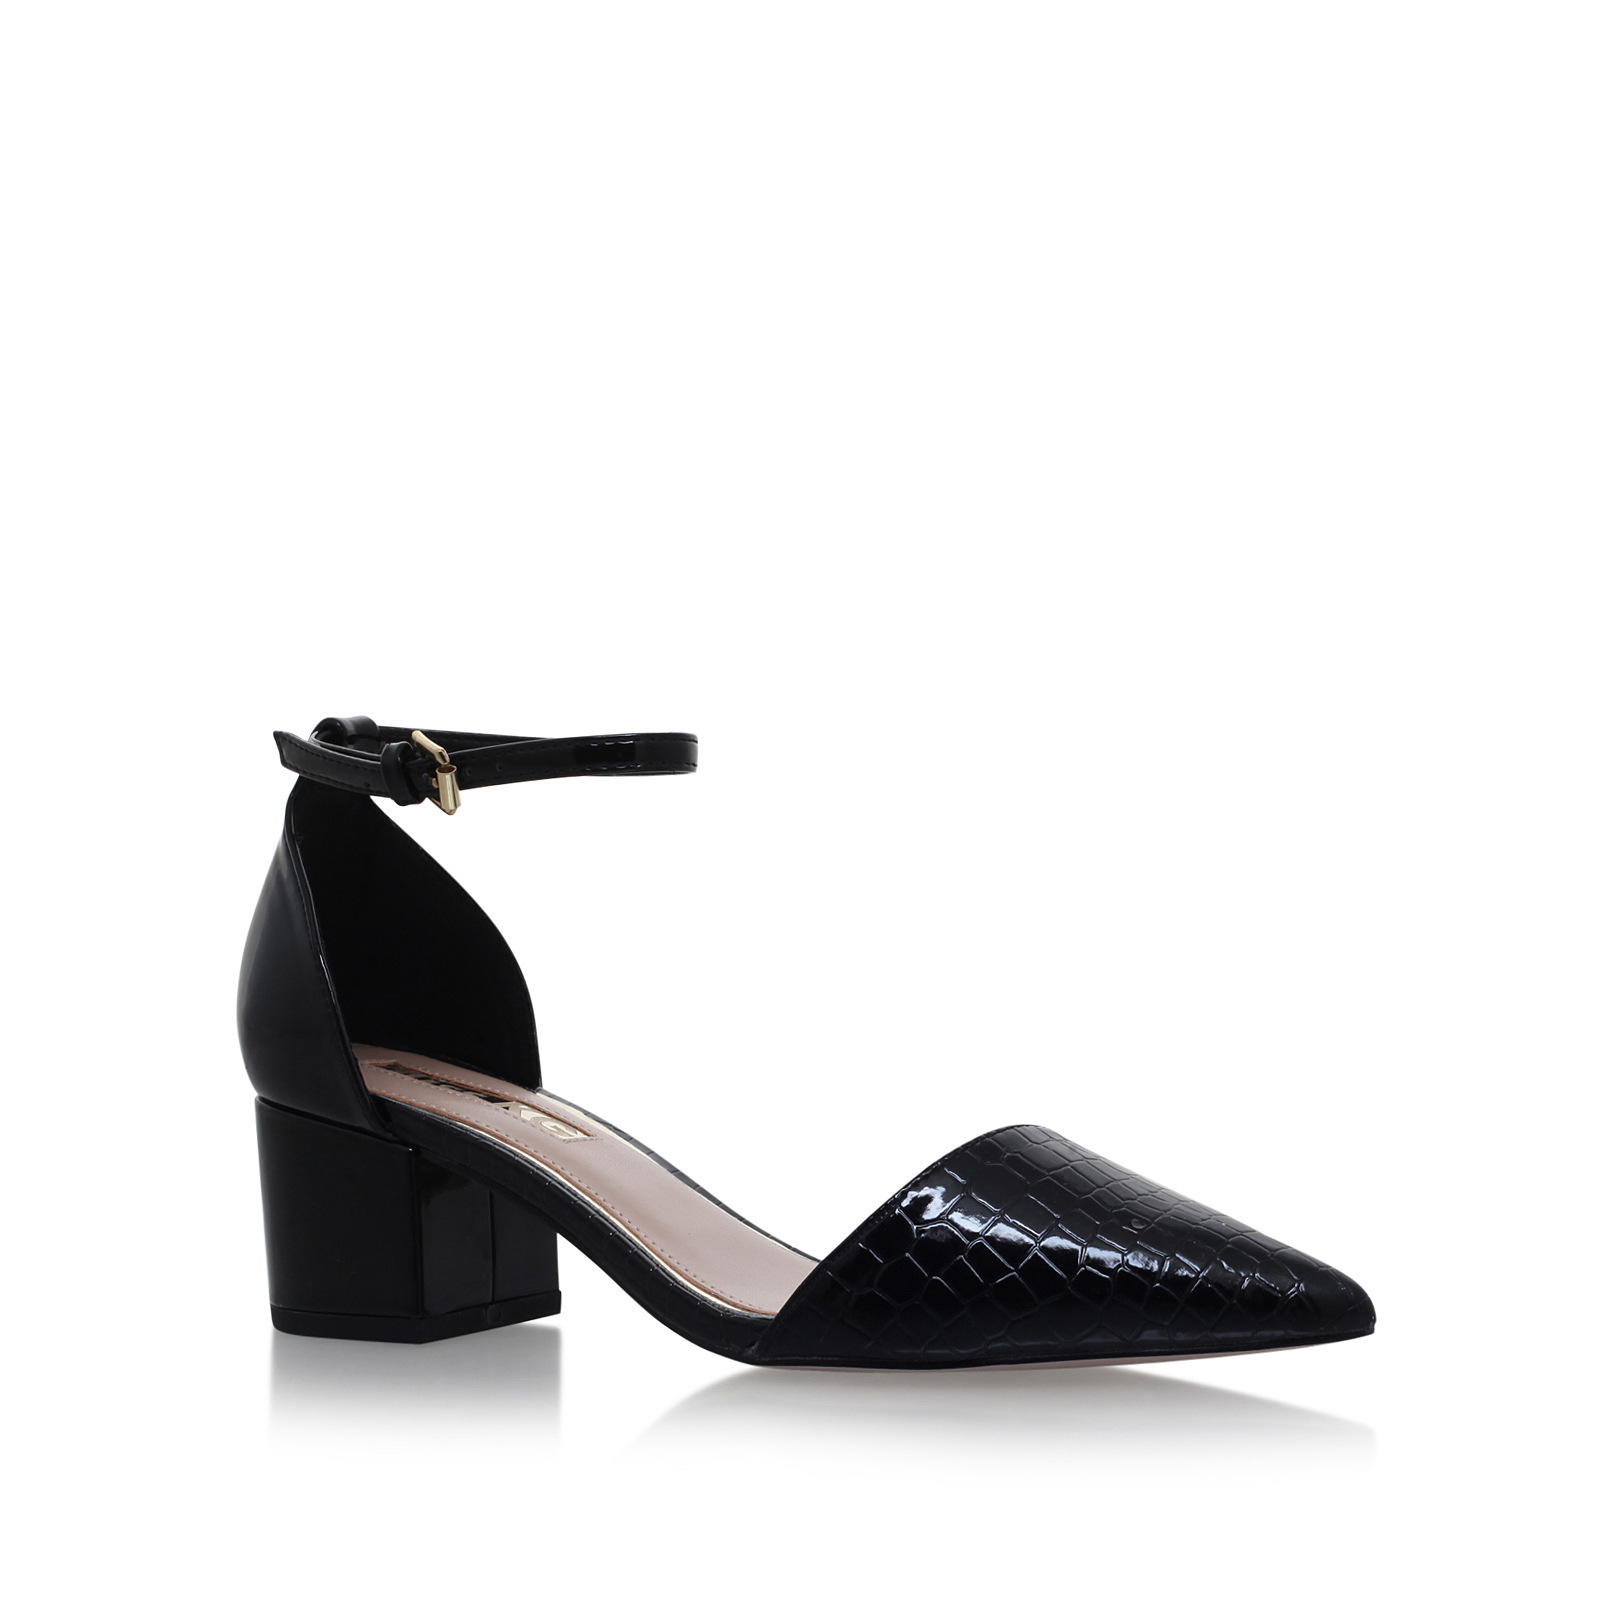 7ce8b1c36ea Carla Mid Heel Court Shoes